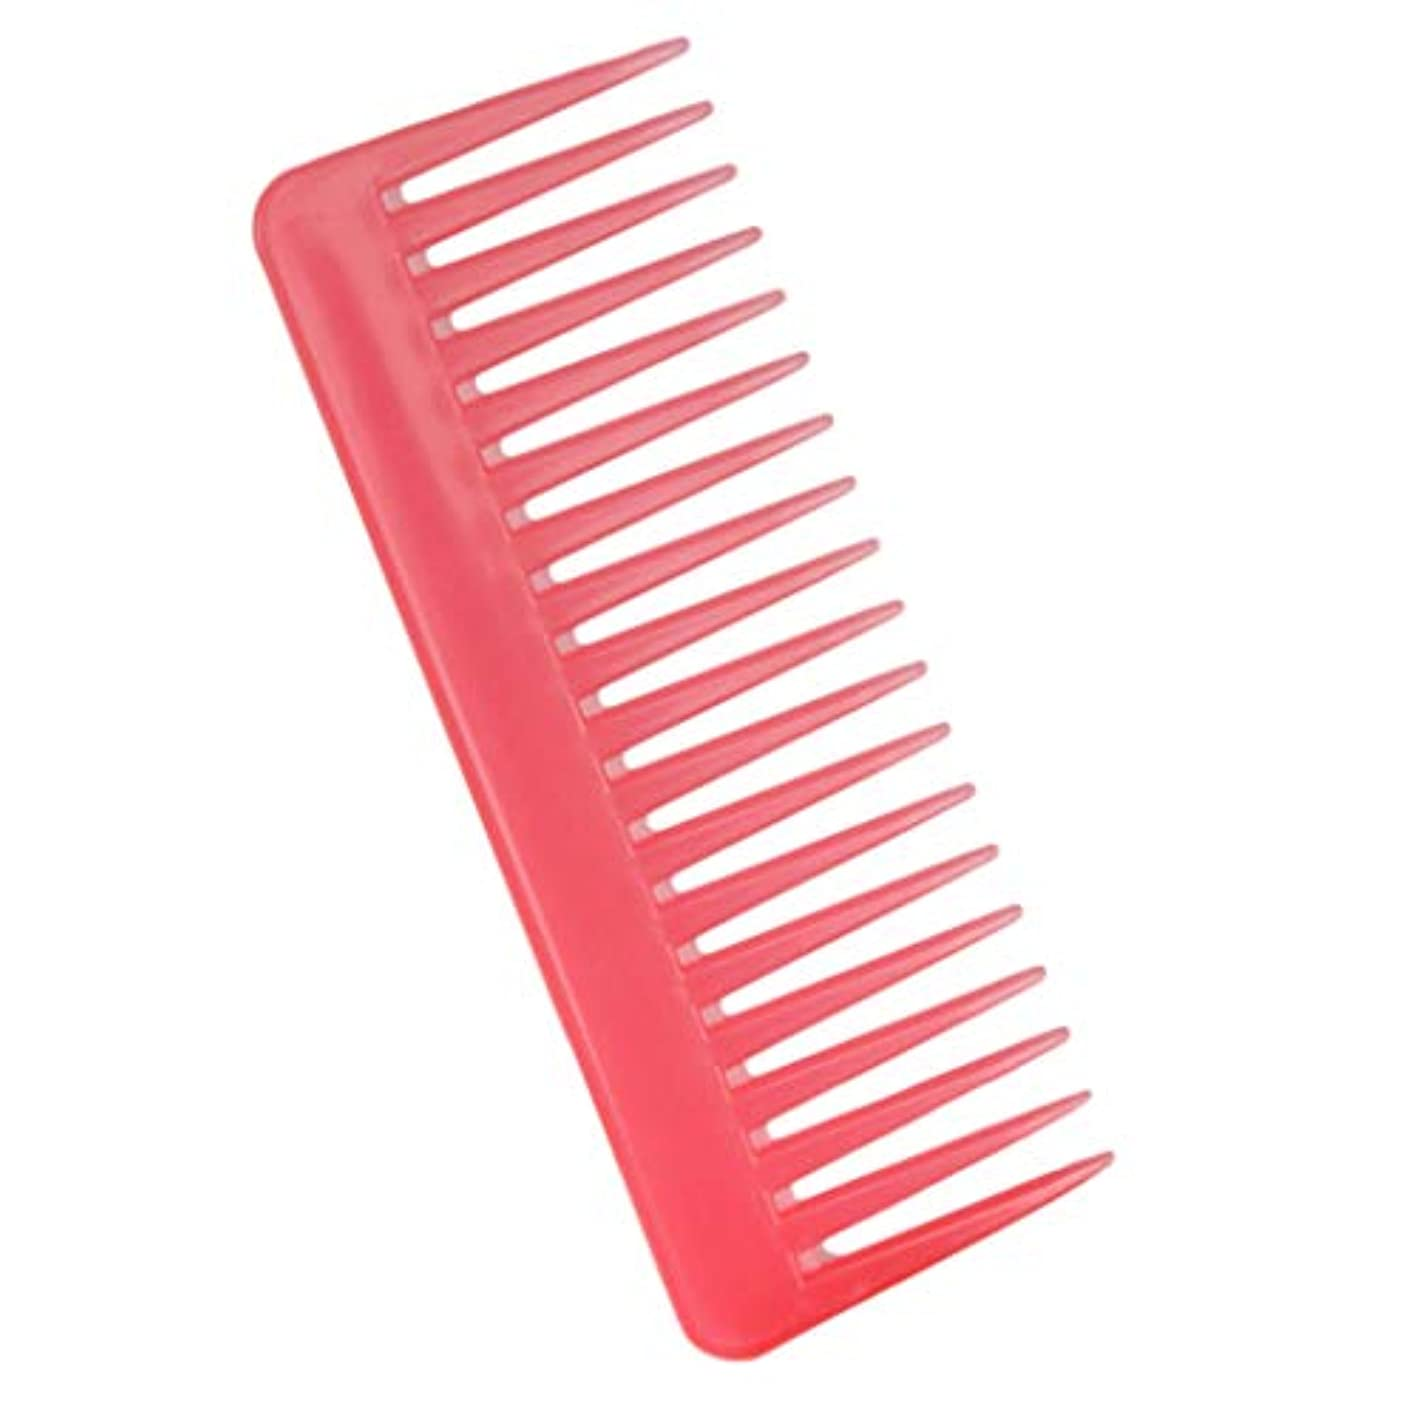 P Prettyia 帯電防止櫛 ヘアケア ヘアブラシ サロン用 自宅用 ヘアコーム 3色選べ - ピンク